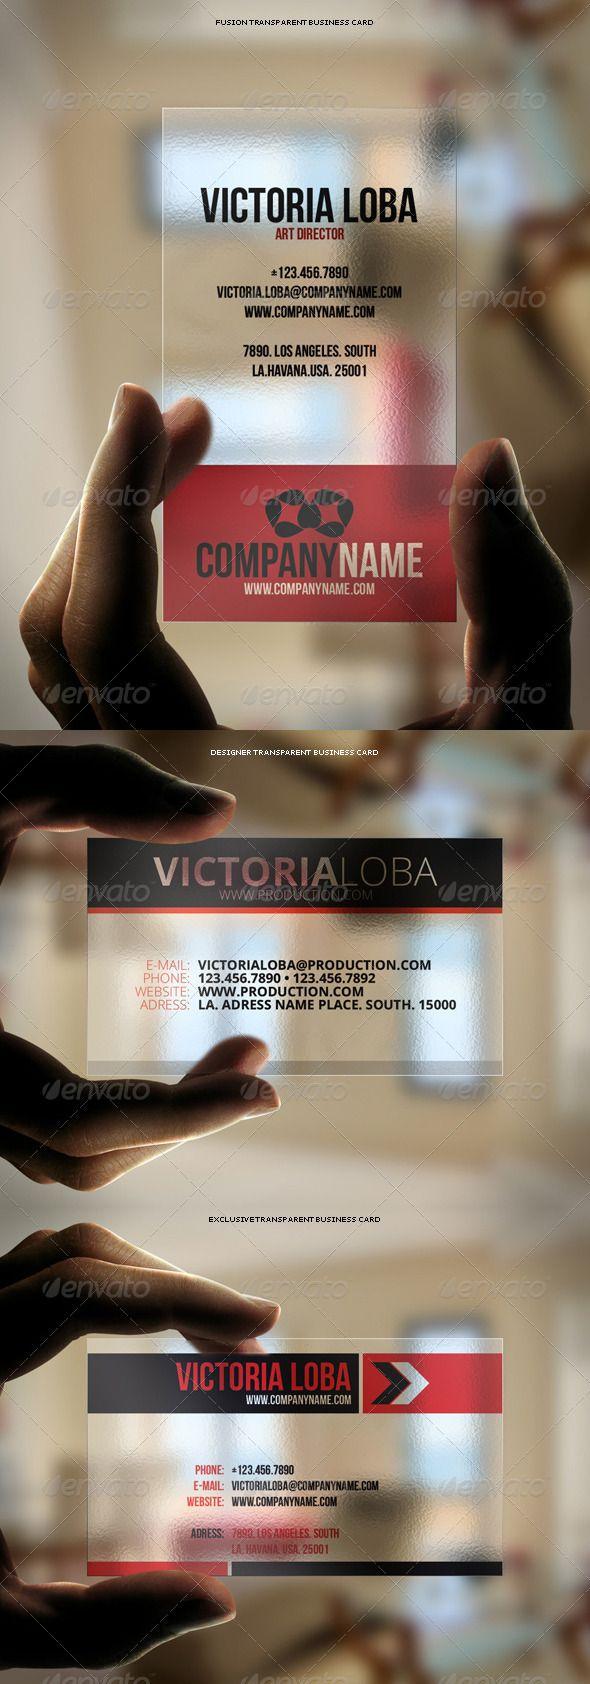 3in1 Transparent Business Cards Bundle #3